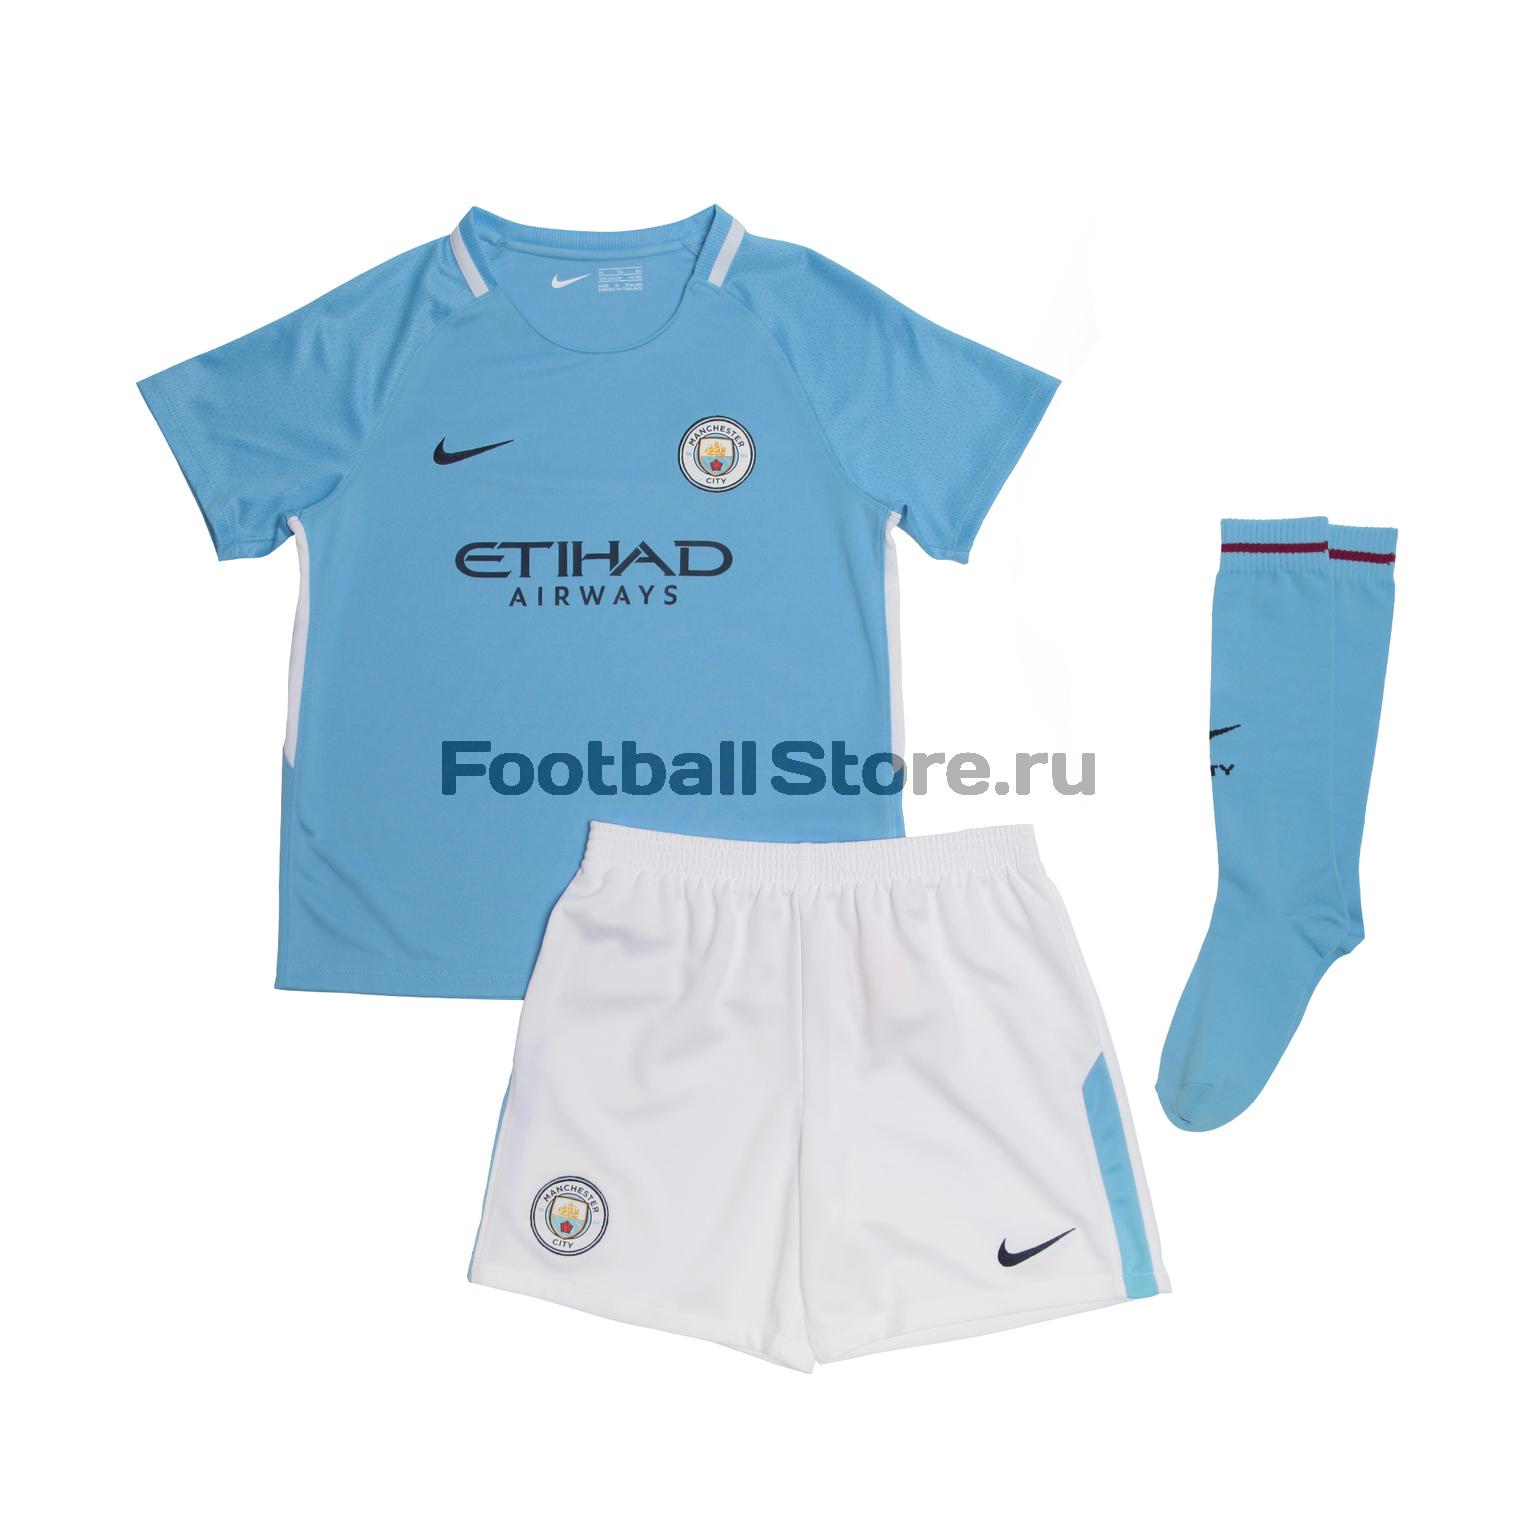 Комплекты формы Nike Комплект детской формы Nike Manchester City 847362-489